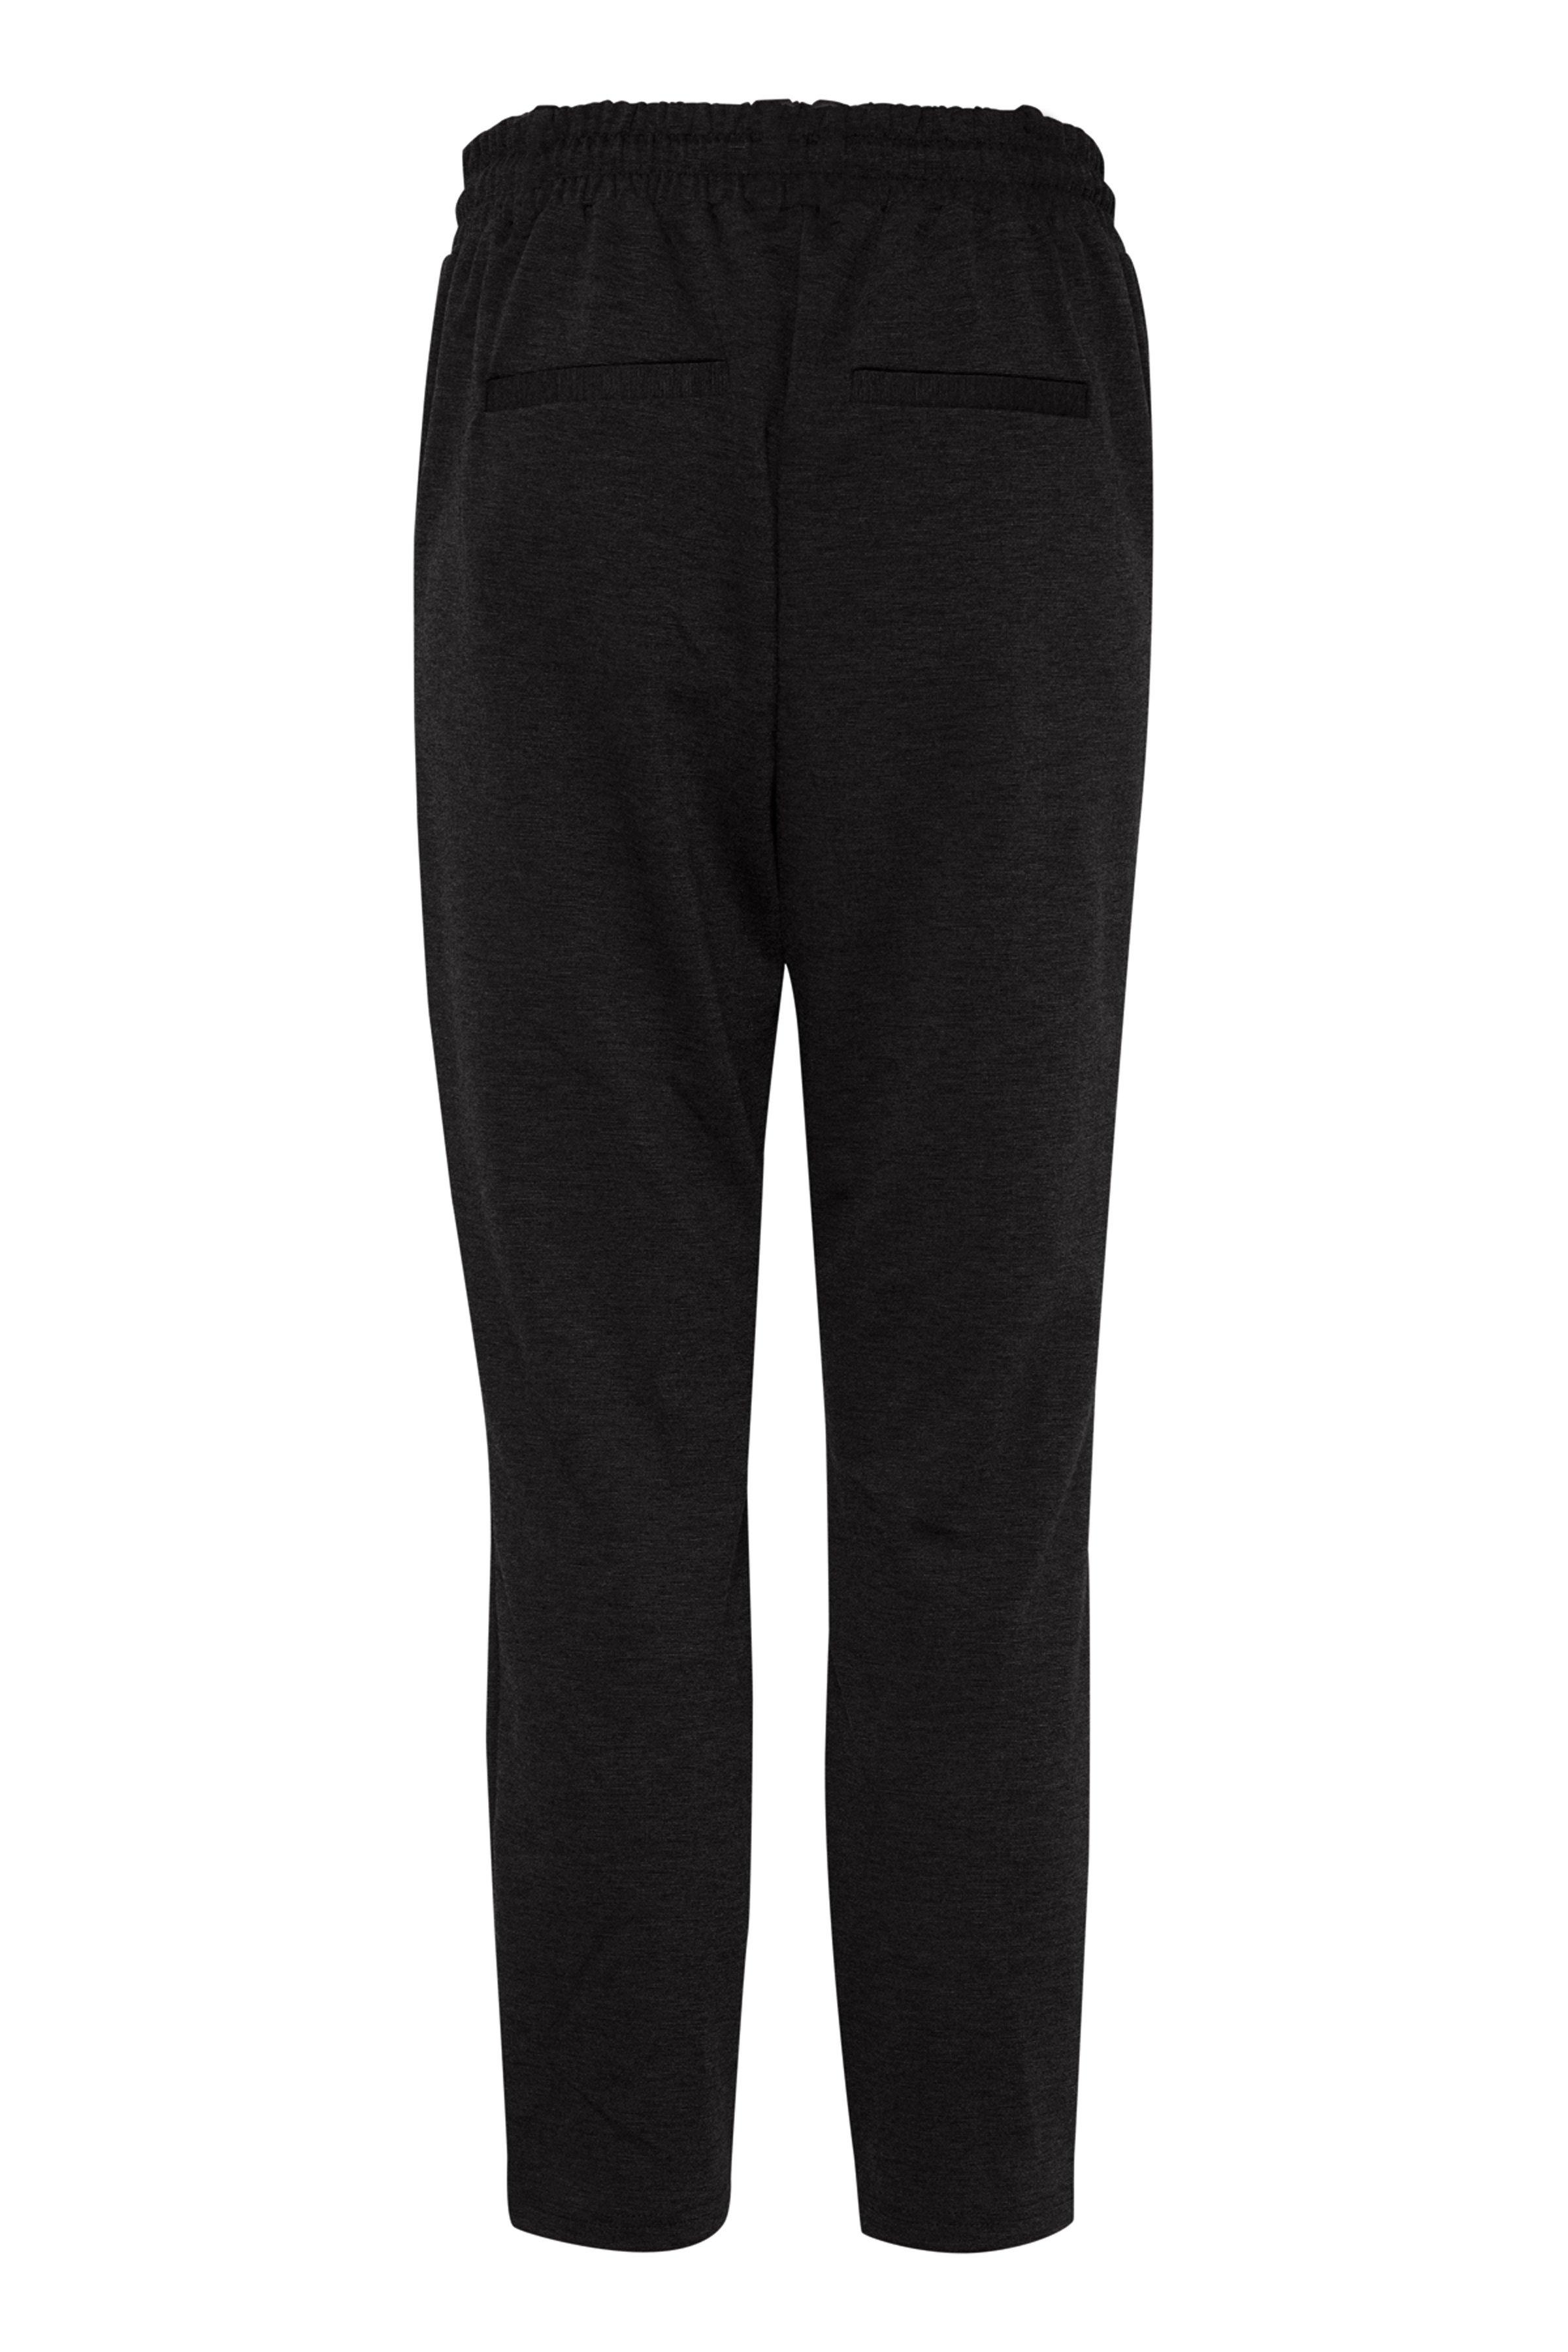 Black Pants Casual van b.young – Koop Black Pants Casual hier van size XS-XXL